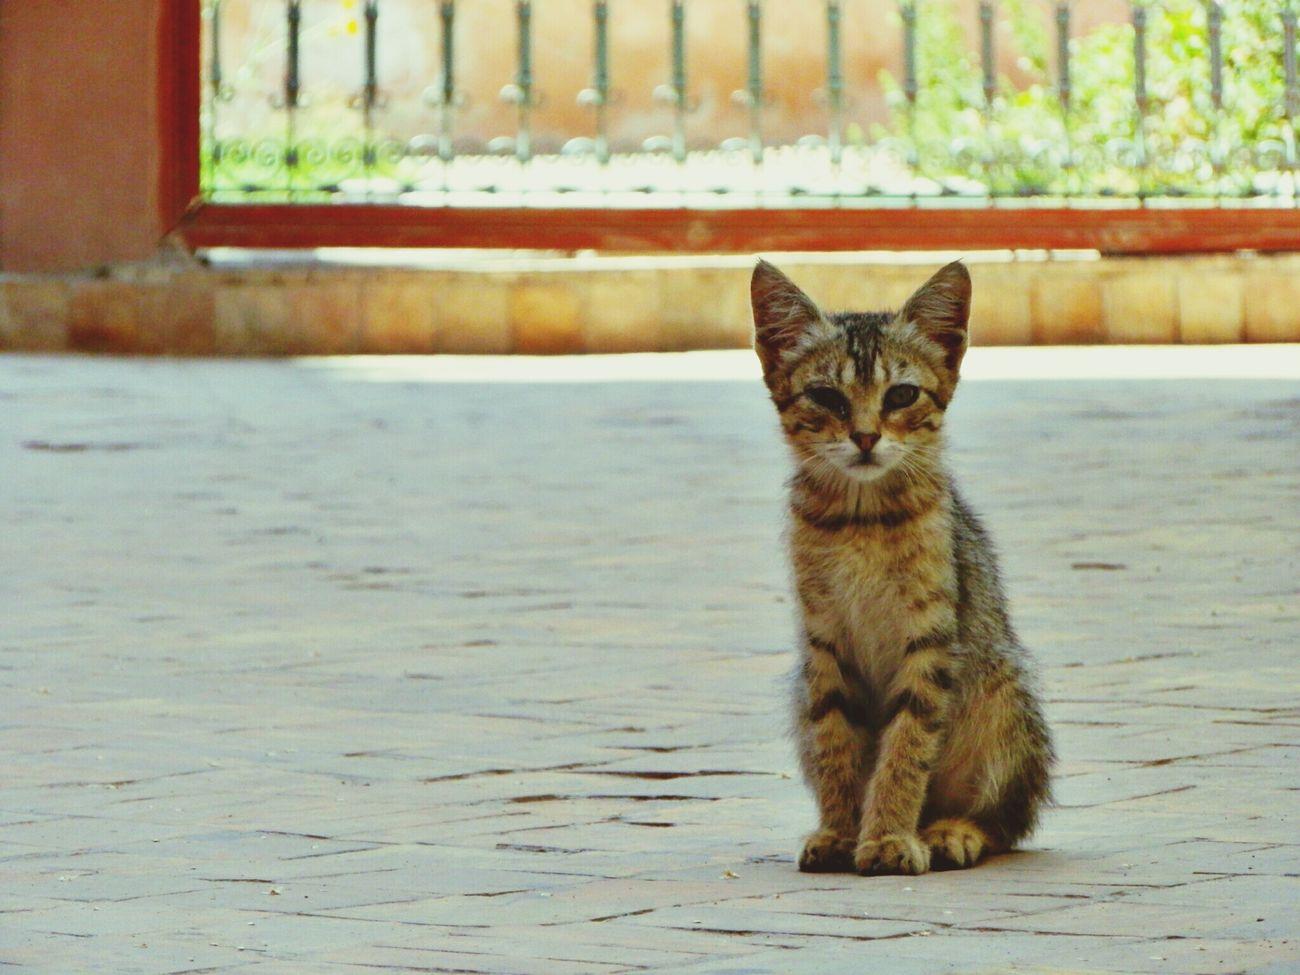 Animal_collection Animal Love EyeEm Best Shots EyeEm Nature Lover